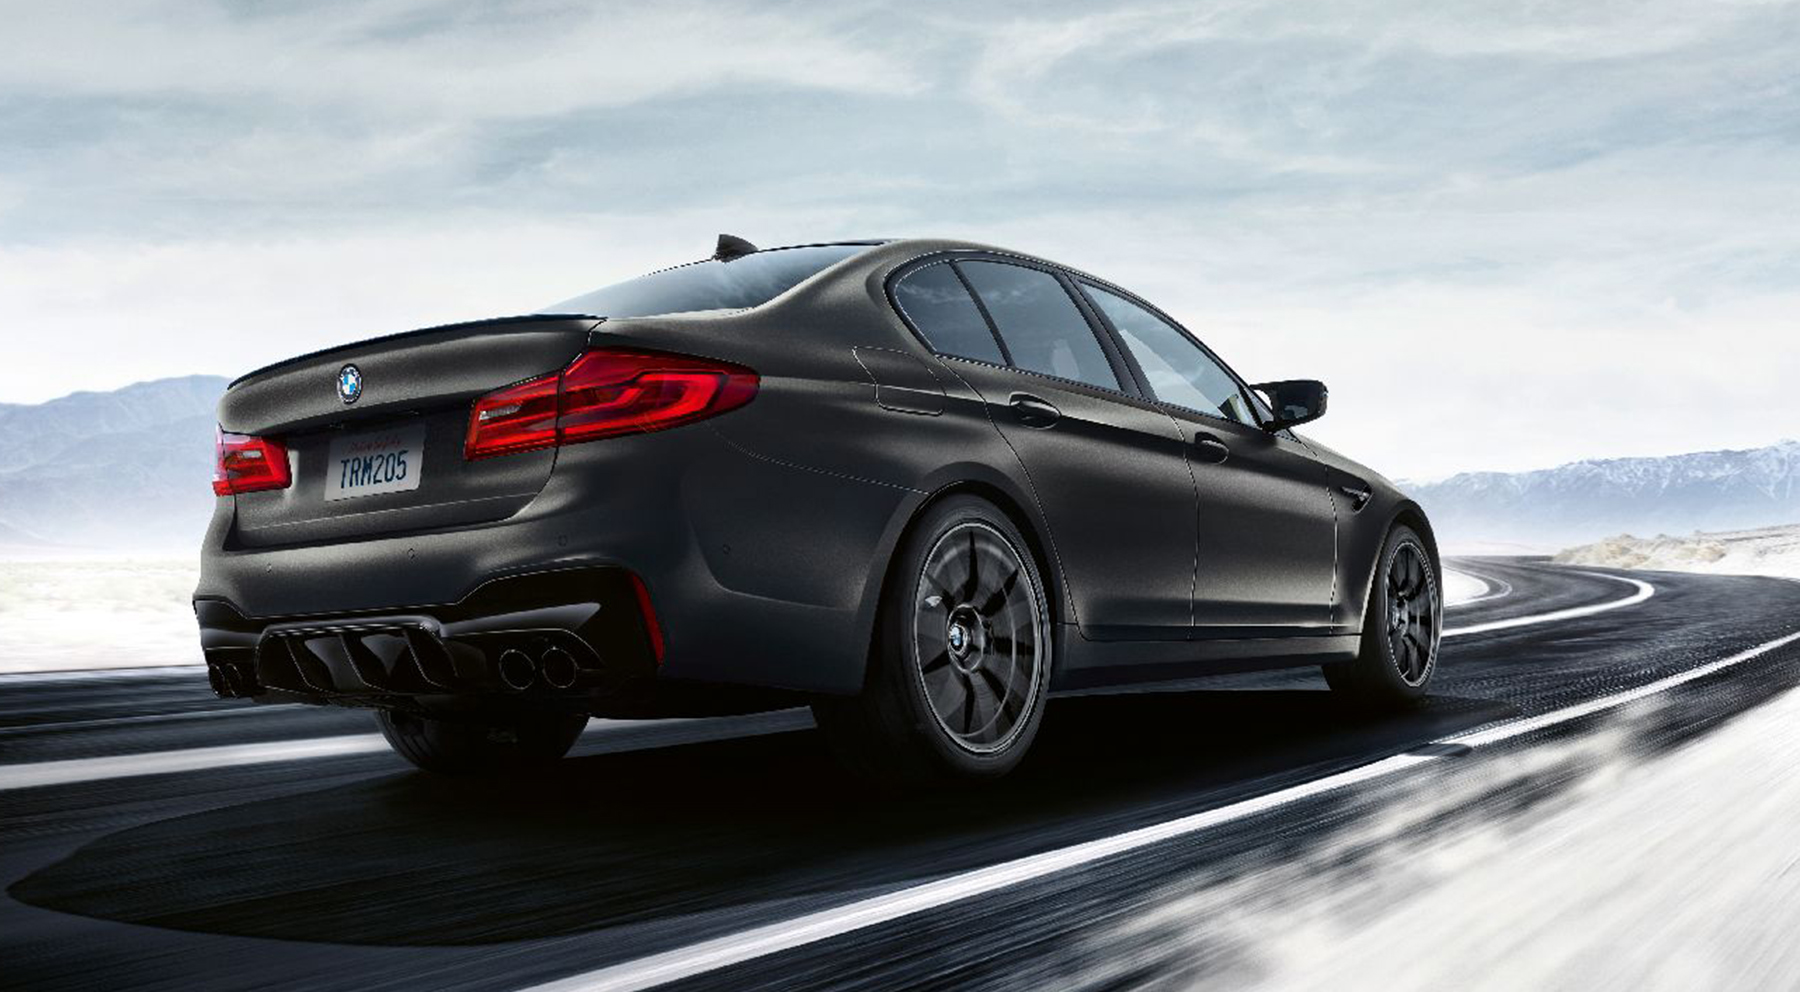 BMW M5 Edición 35 Aniversario: 350 unidades de celebración